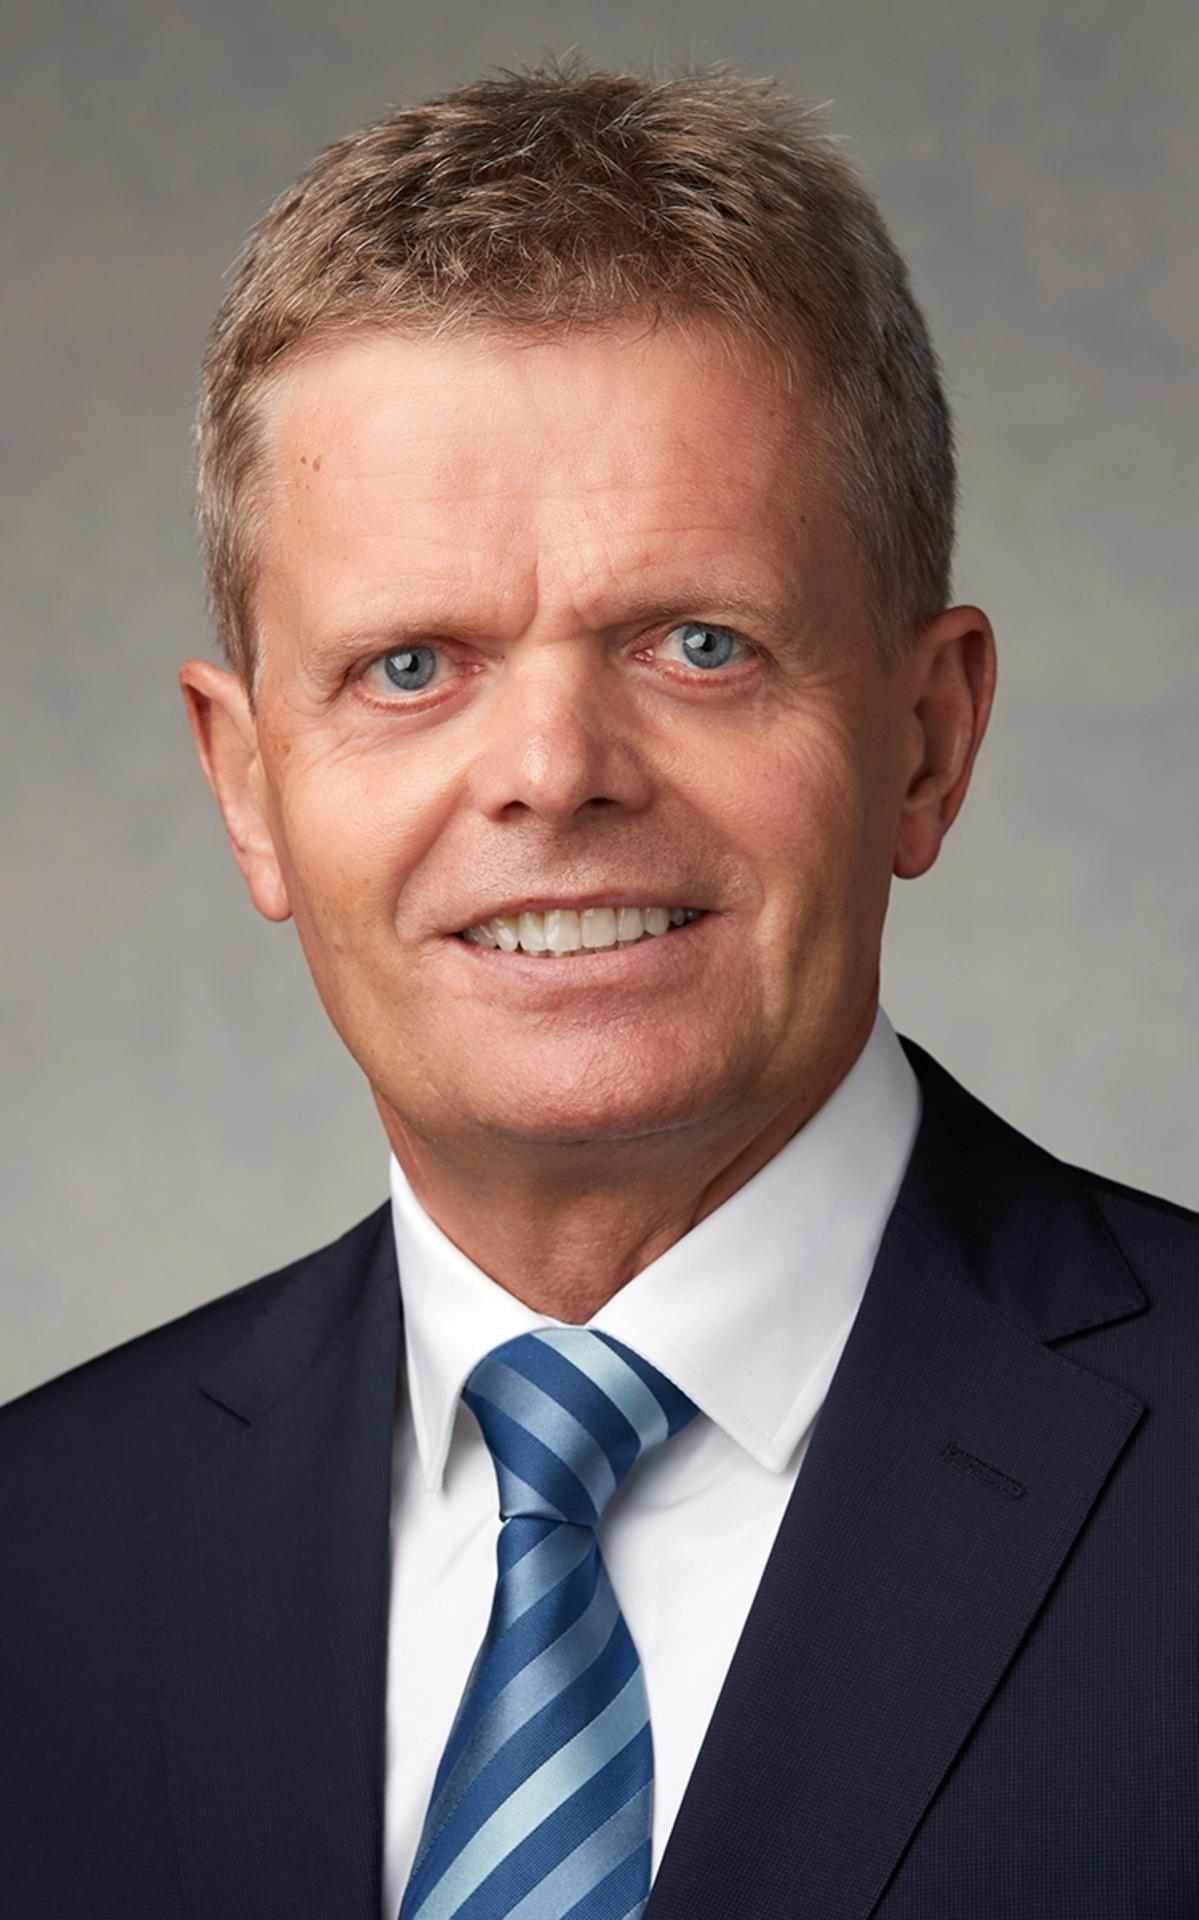 Ouderling Torben Engbjerg (Denemarken)